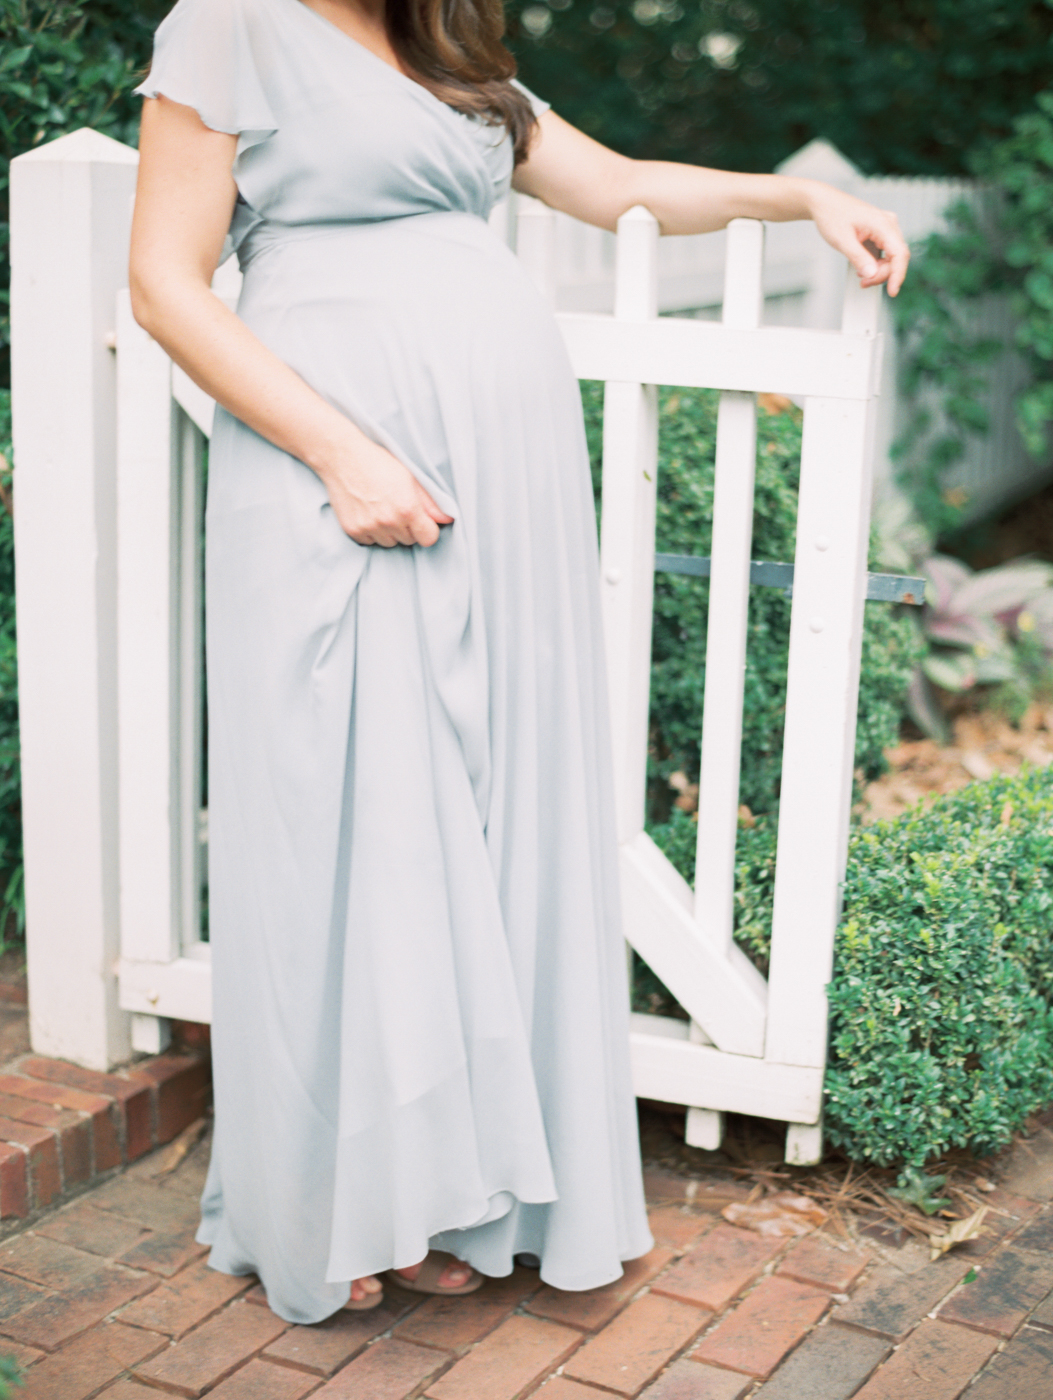 shackleford maternity four corners photography athens maternity photographer anna shackleford photography atlanta film photographer maternity photography-20.jpg